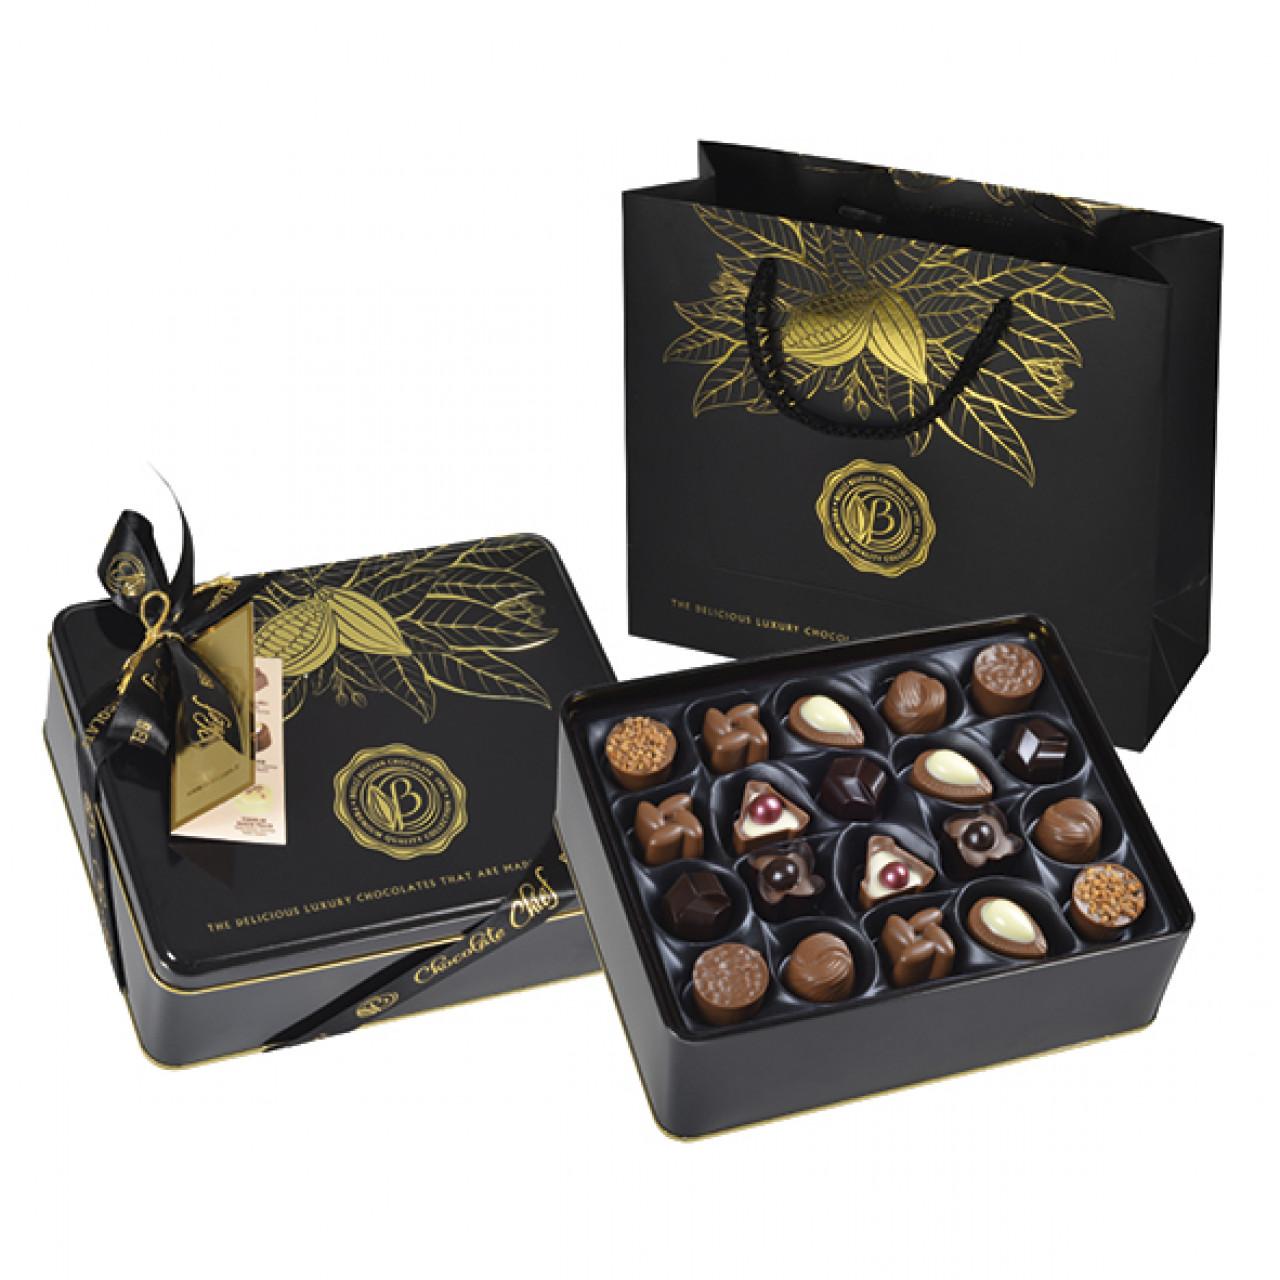 Special Çikolata Teneke Kutu 500 g